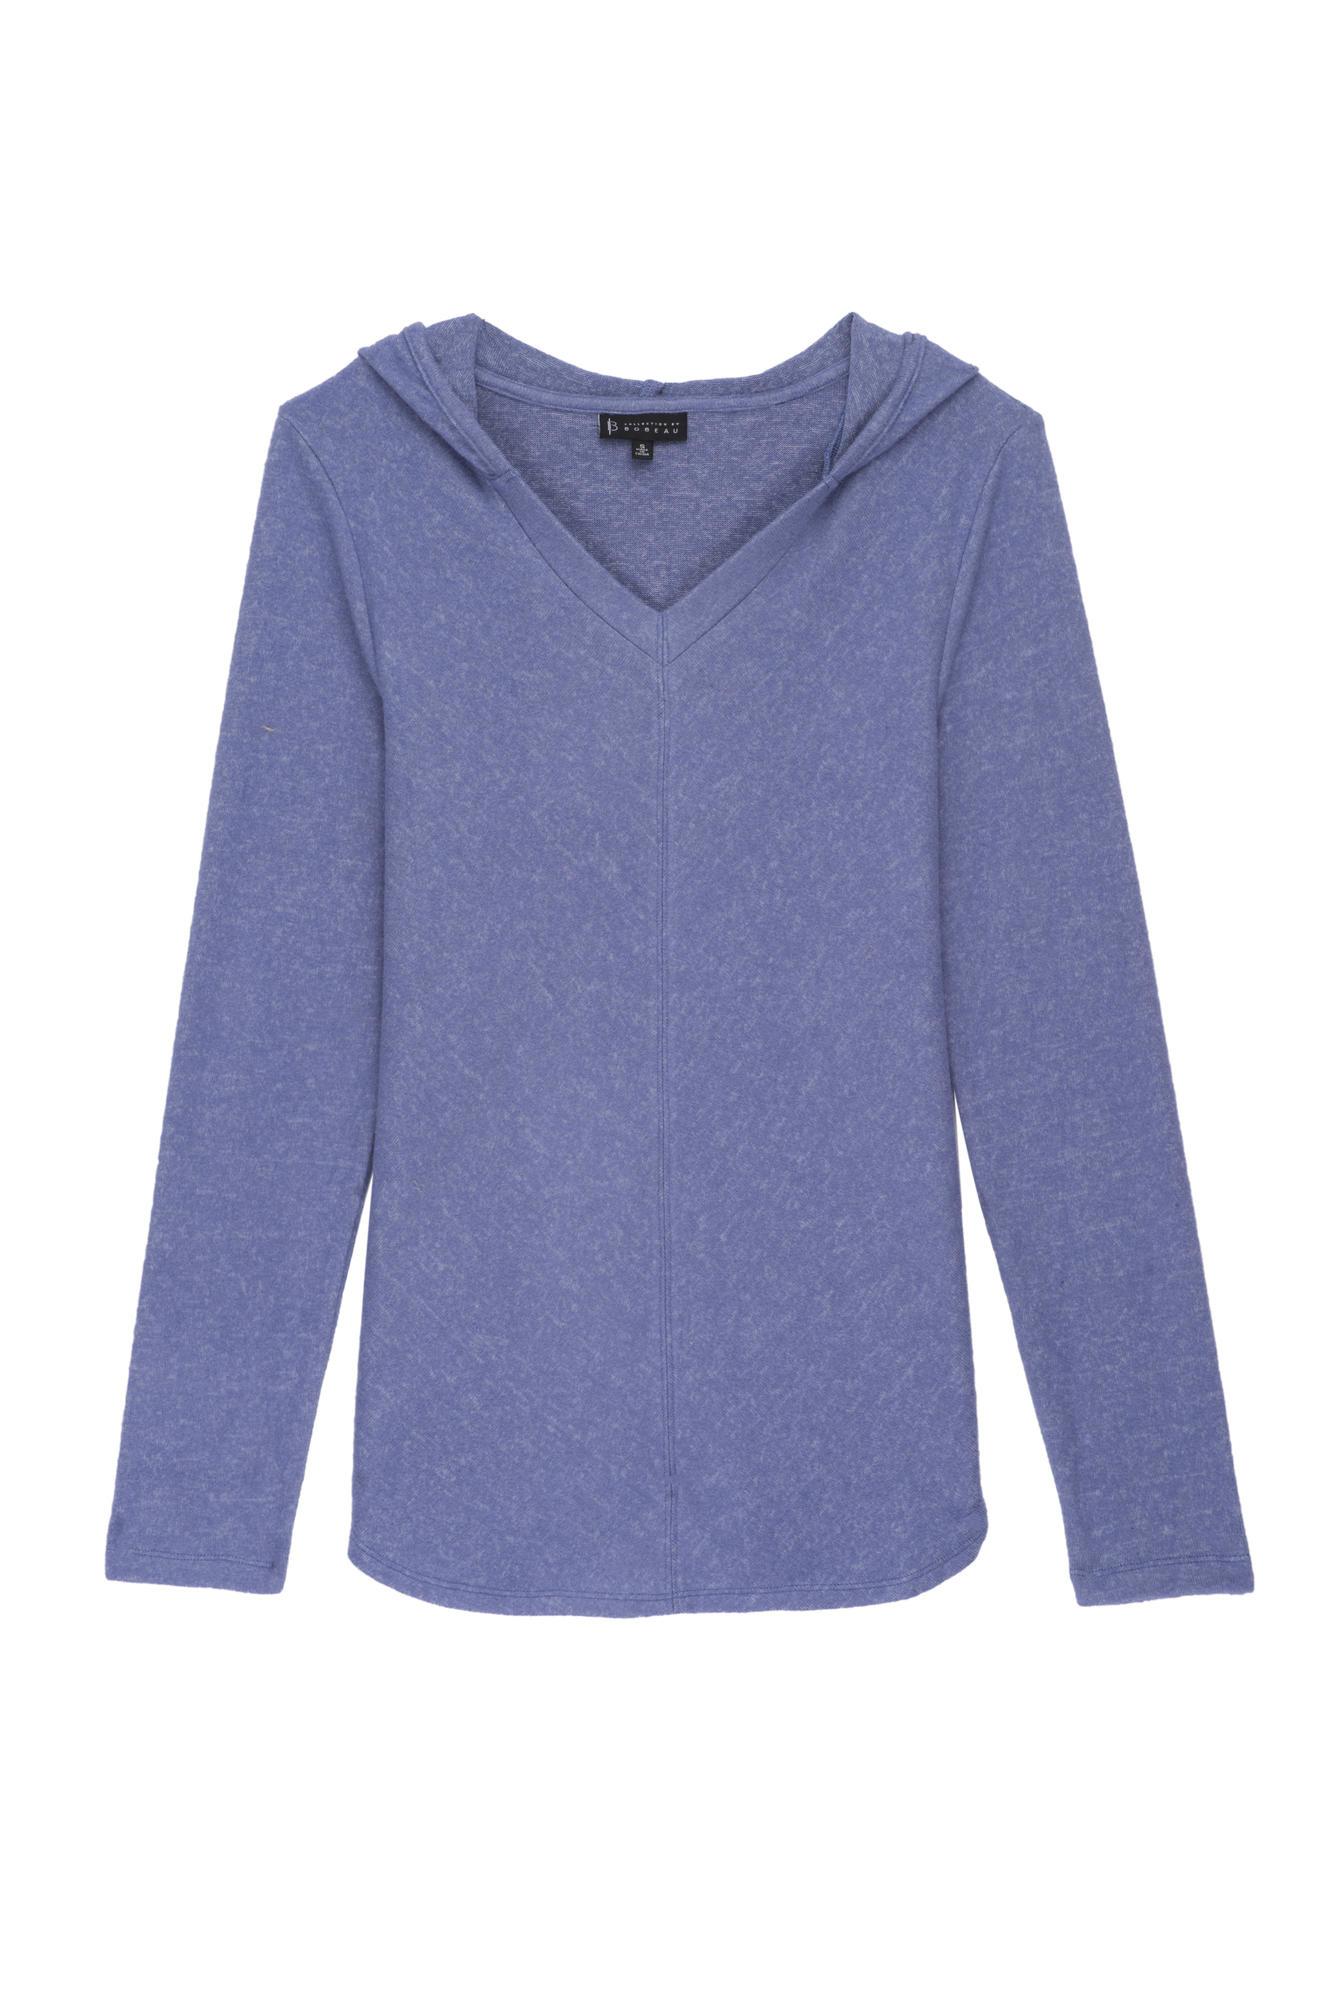 Bobeau Bobeau Cozy Sweater Hoodie